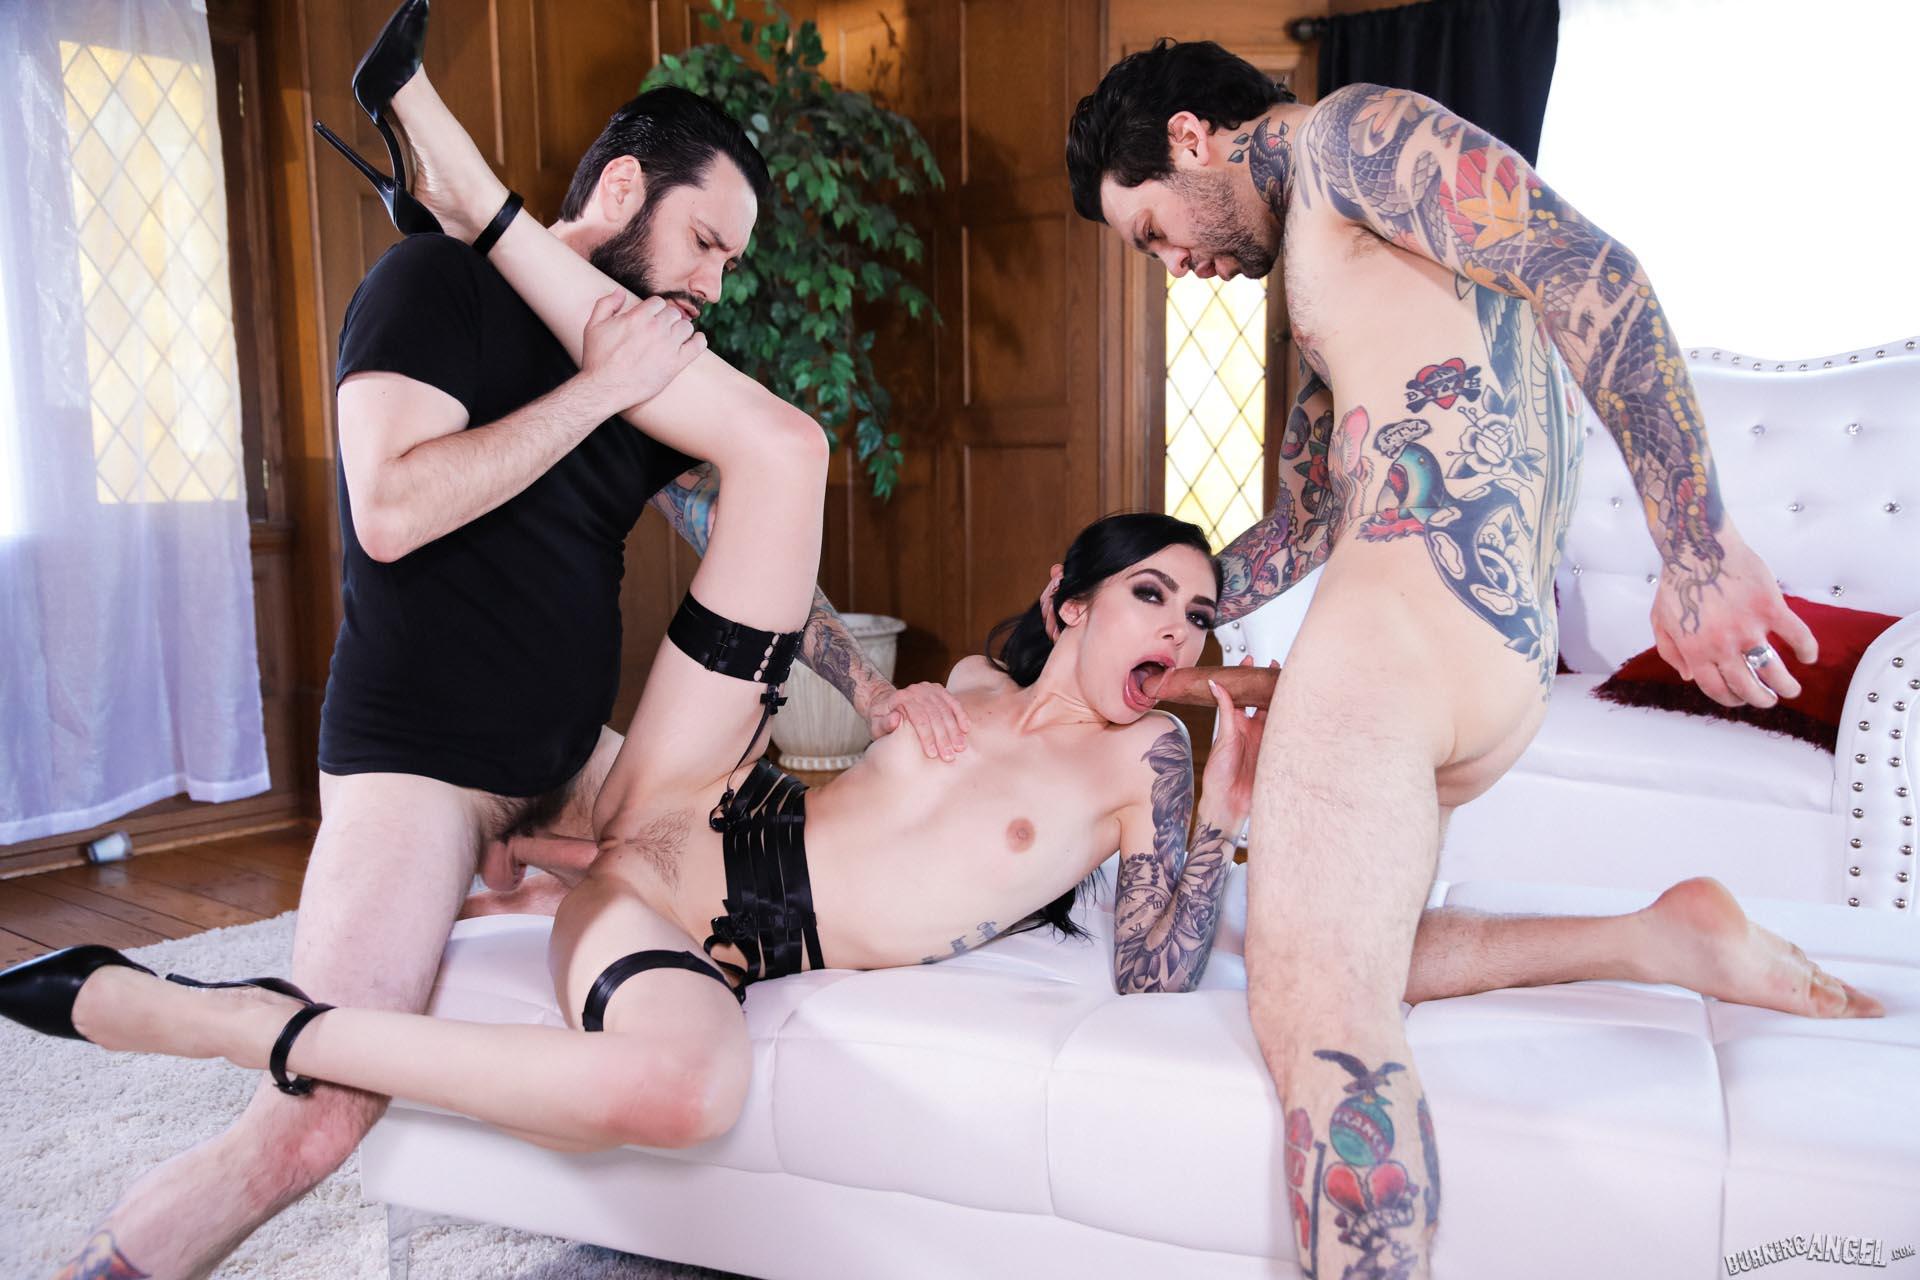 Goth Anal Whores 2 Marley Brinx Gets Dpd 7